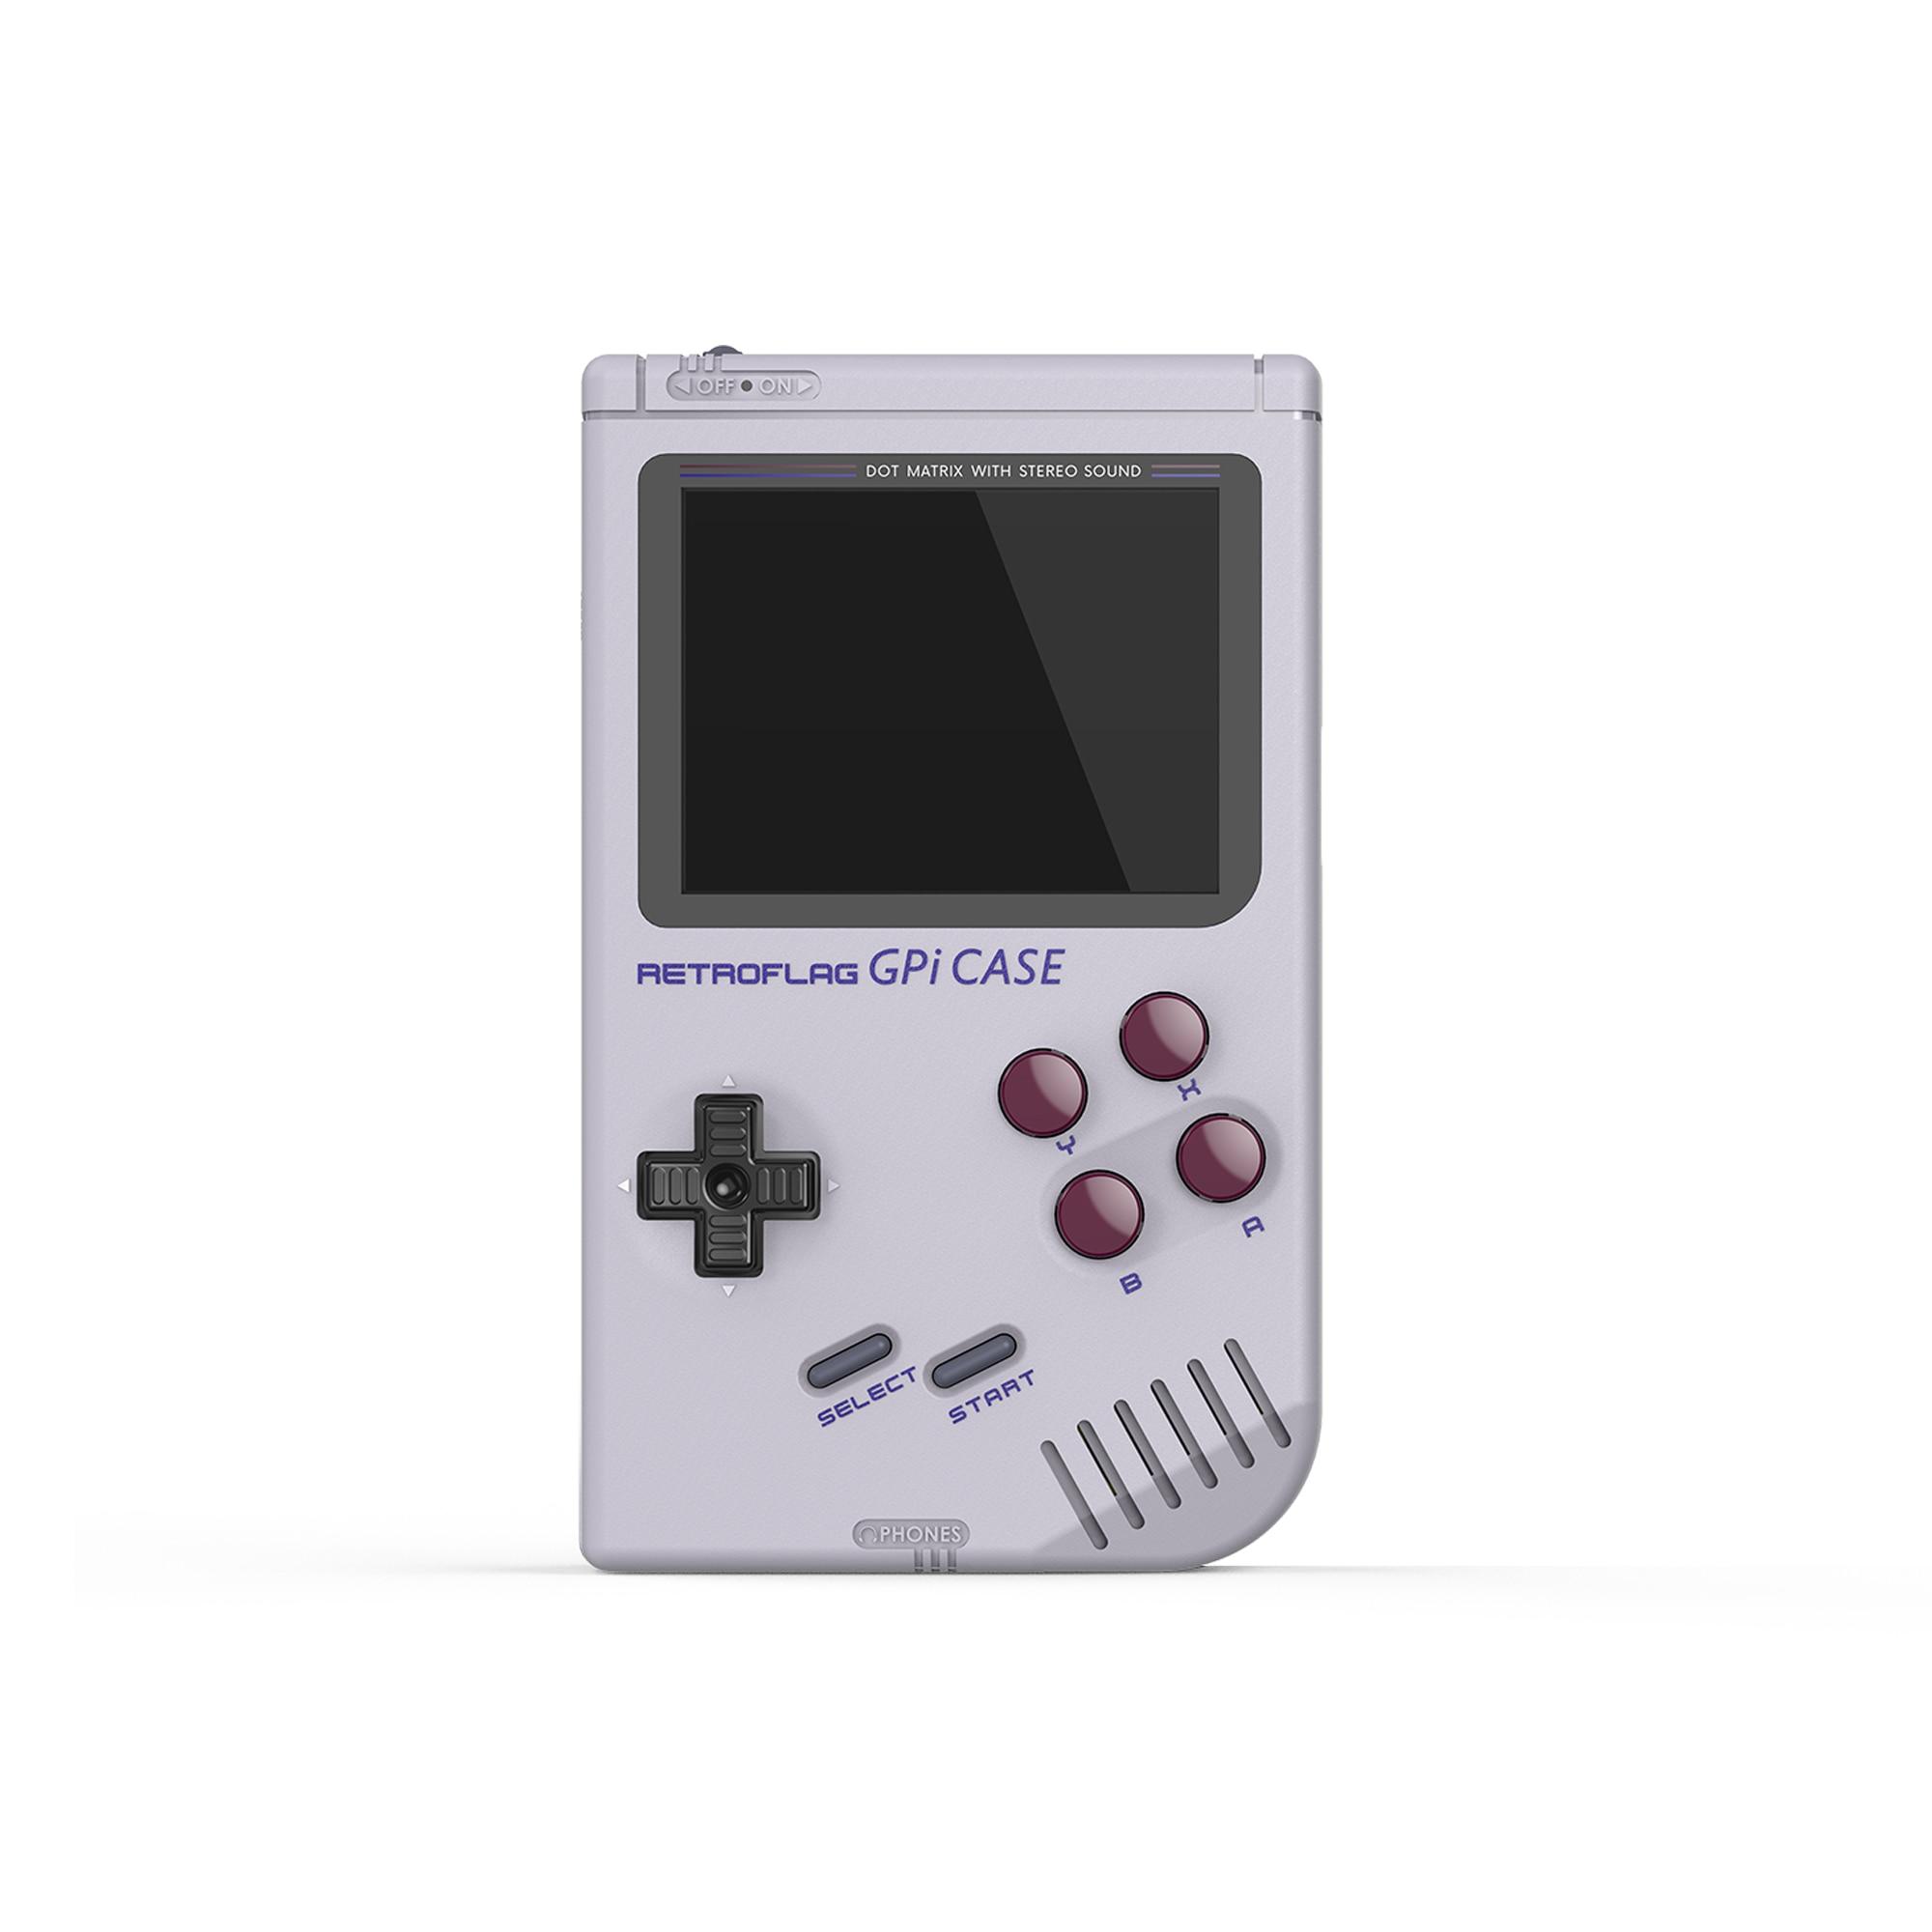 Original Retroflag GPi CASE Kit For Raspberry Pi Zero / Zero W Safe Shutdown Portable Handheld Game Console